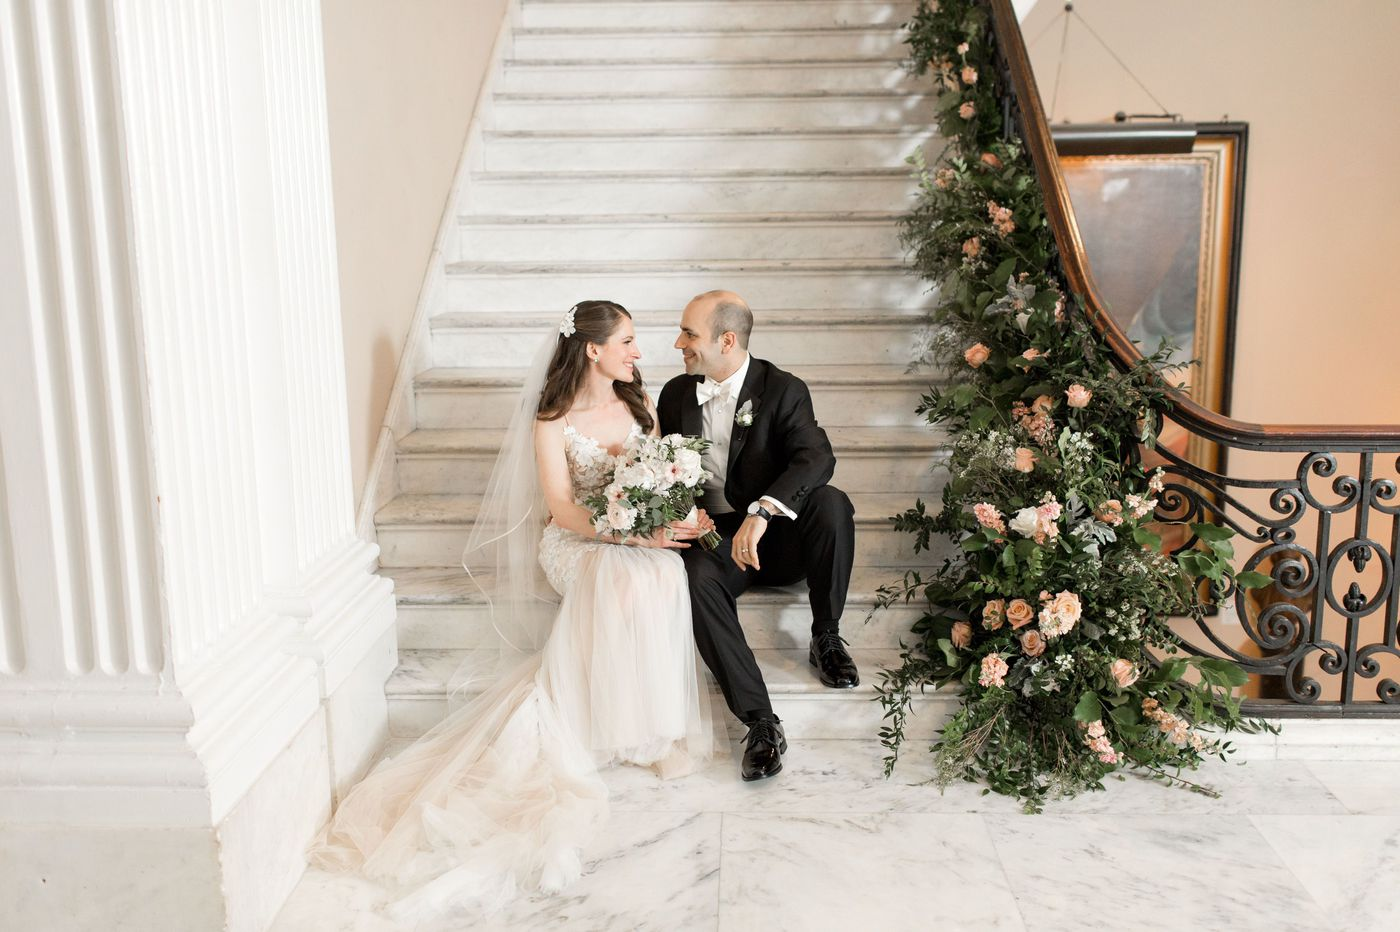 Philadelphia weddings: Madeline Sasso and Joseph Dell'Aquila